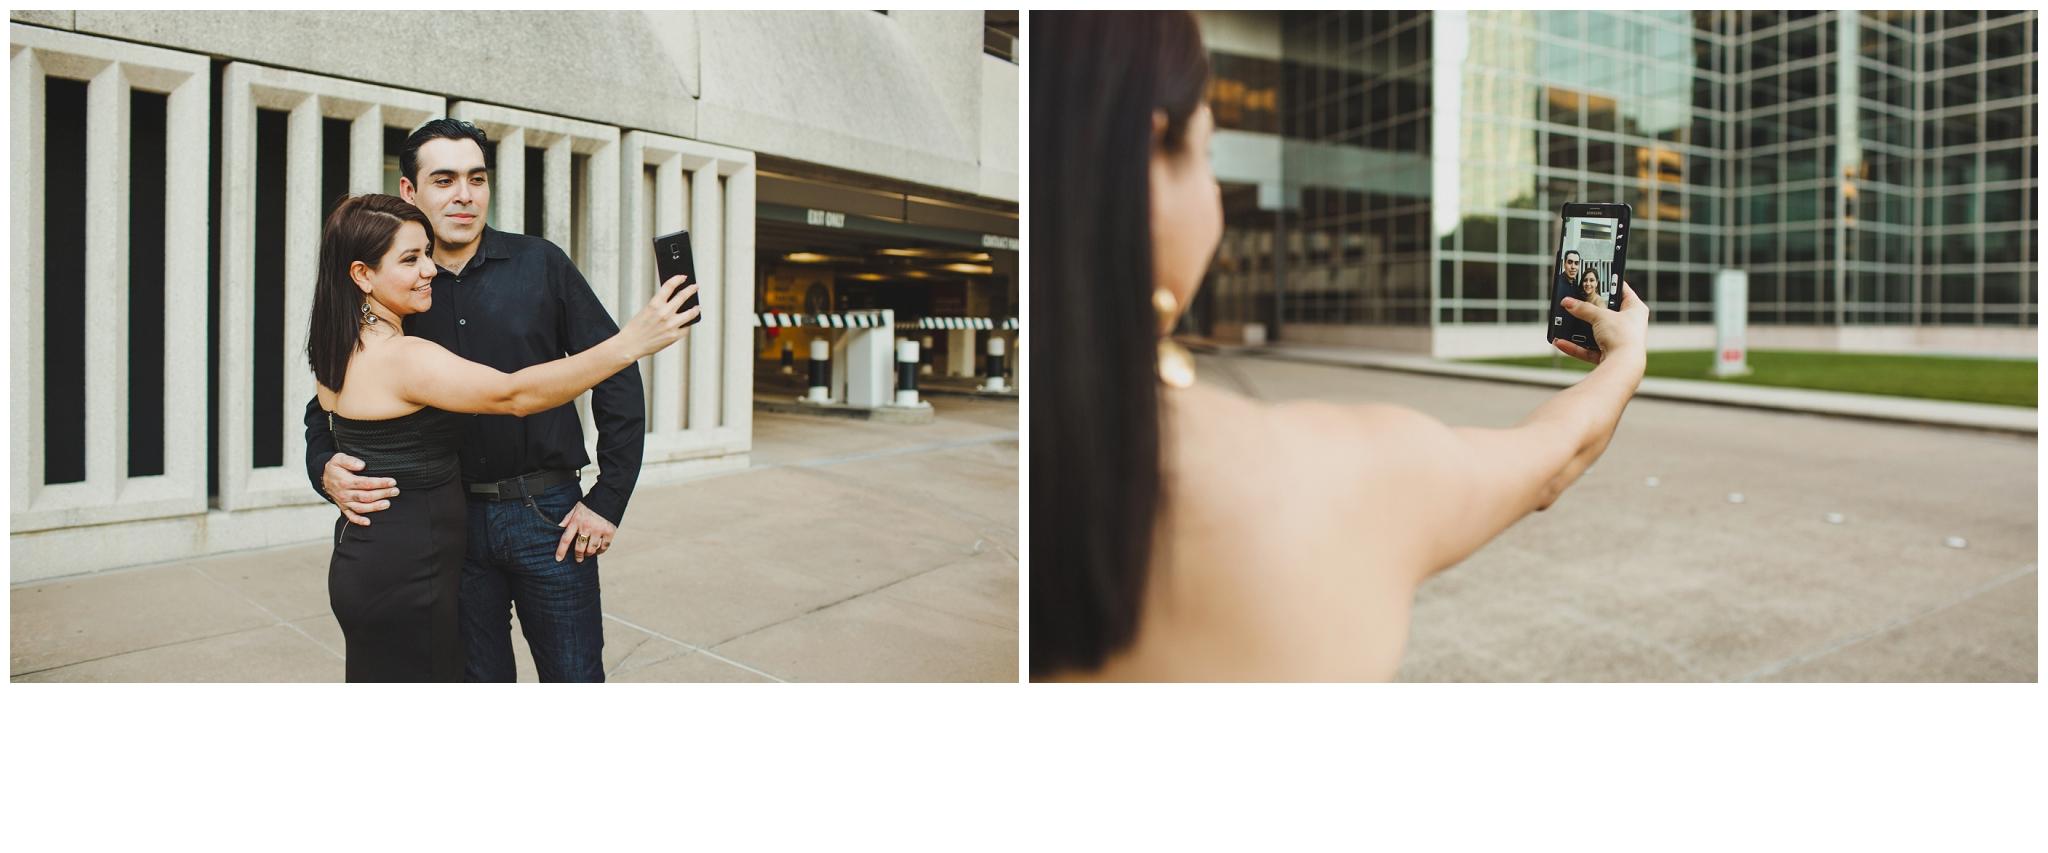 houston-engagement-photographer-waterwall-proposal-downtown_0018.jpg